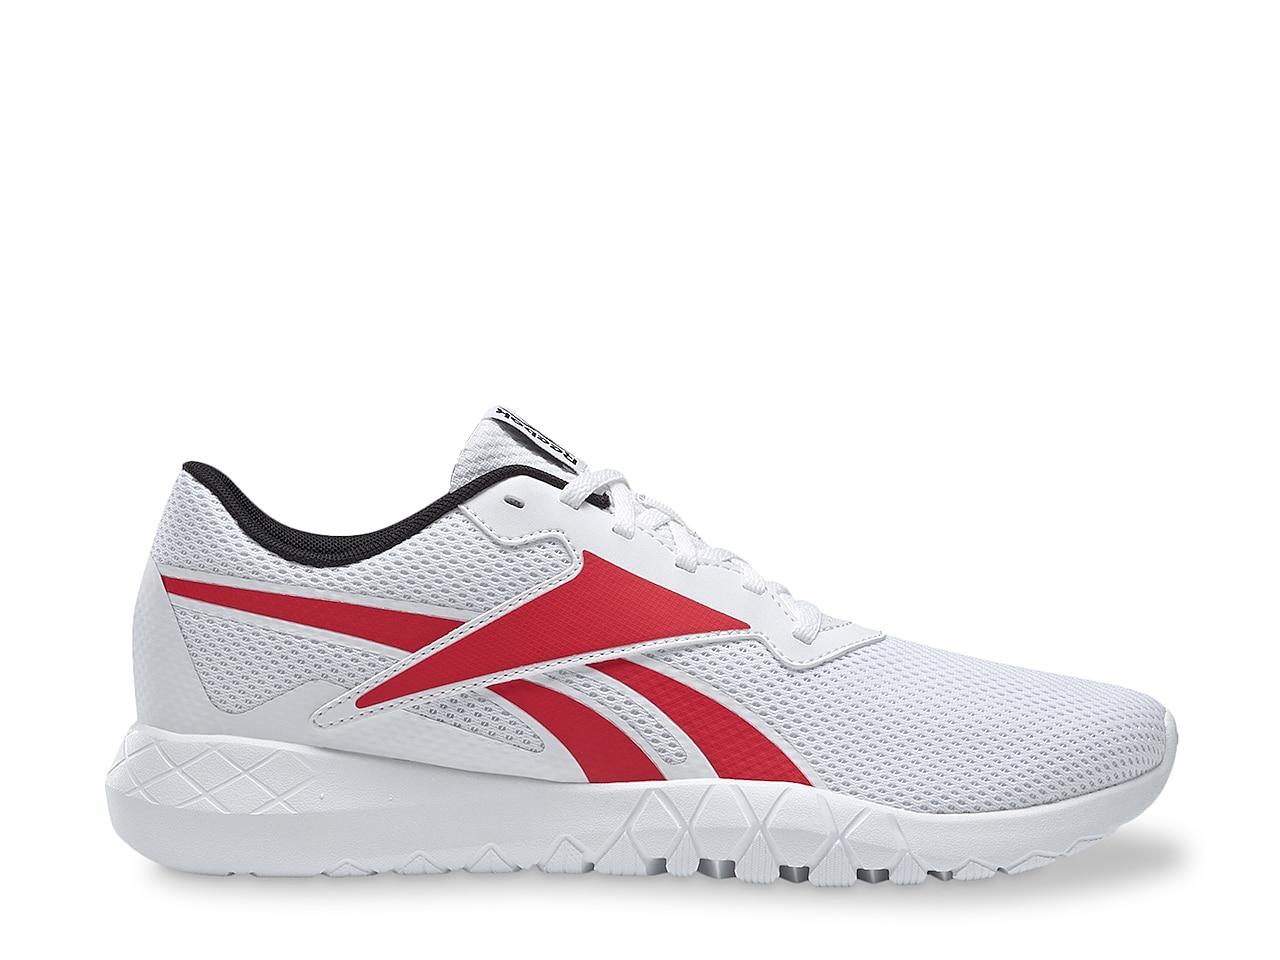 Reebok Flexagon Energy TR 3.0 Training Shoe - Men's